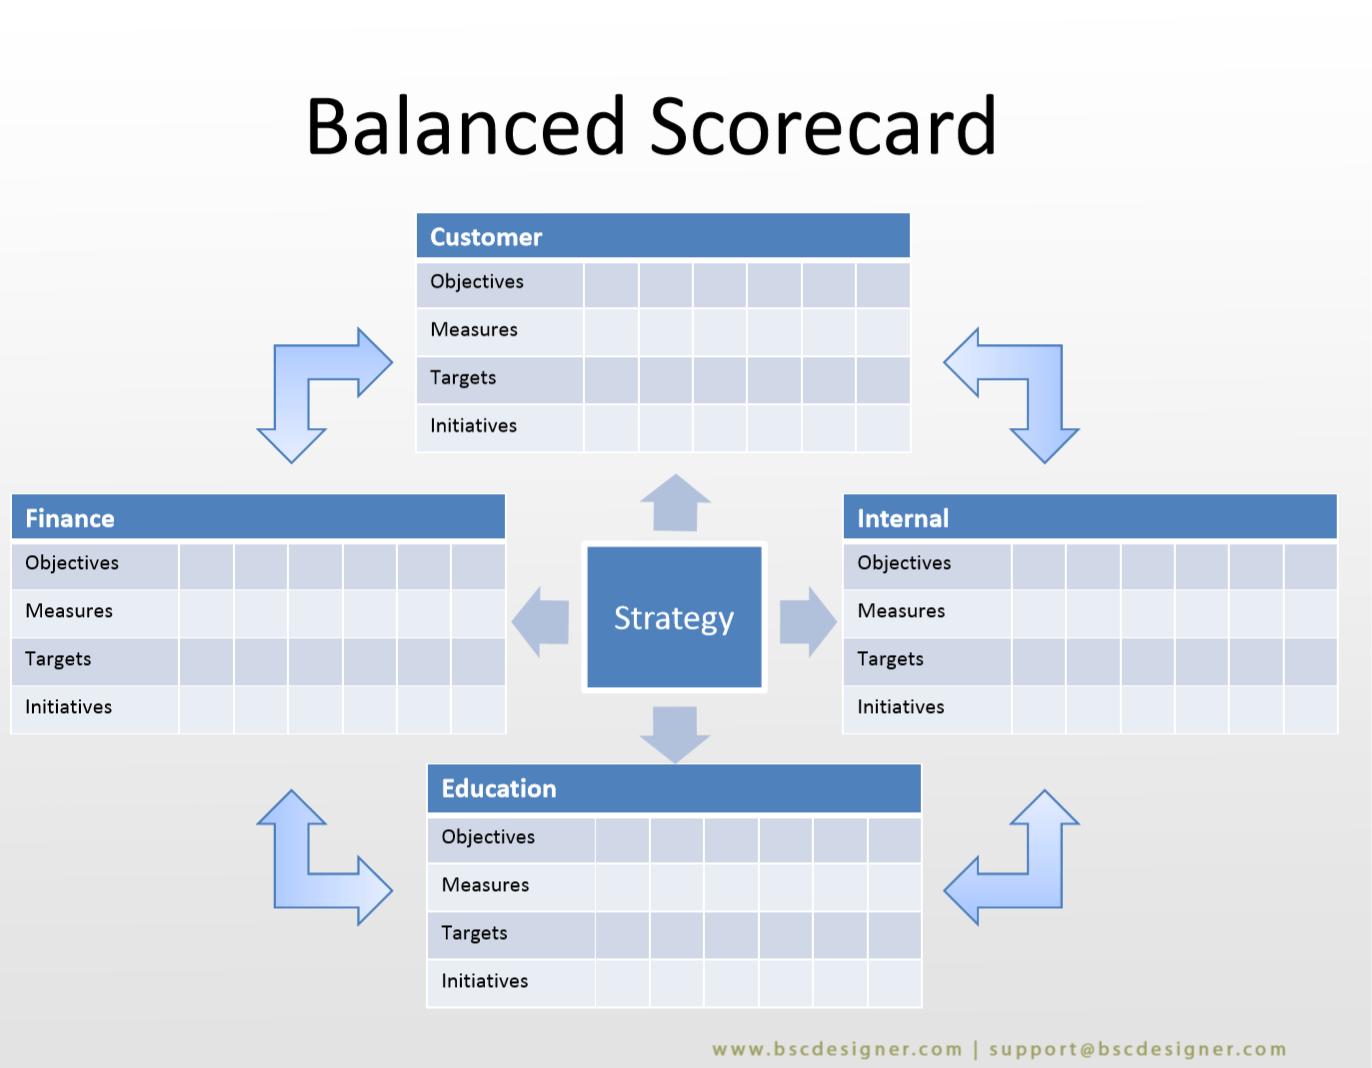 19 Balanced Scorecard Examples With Kpis